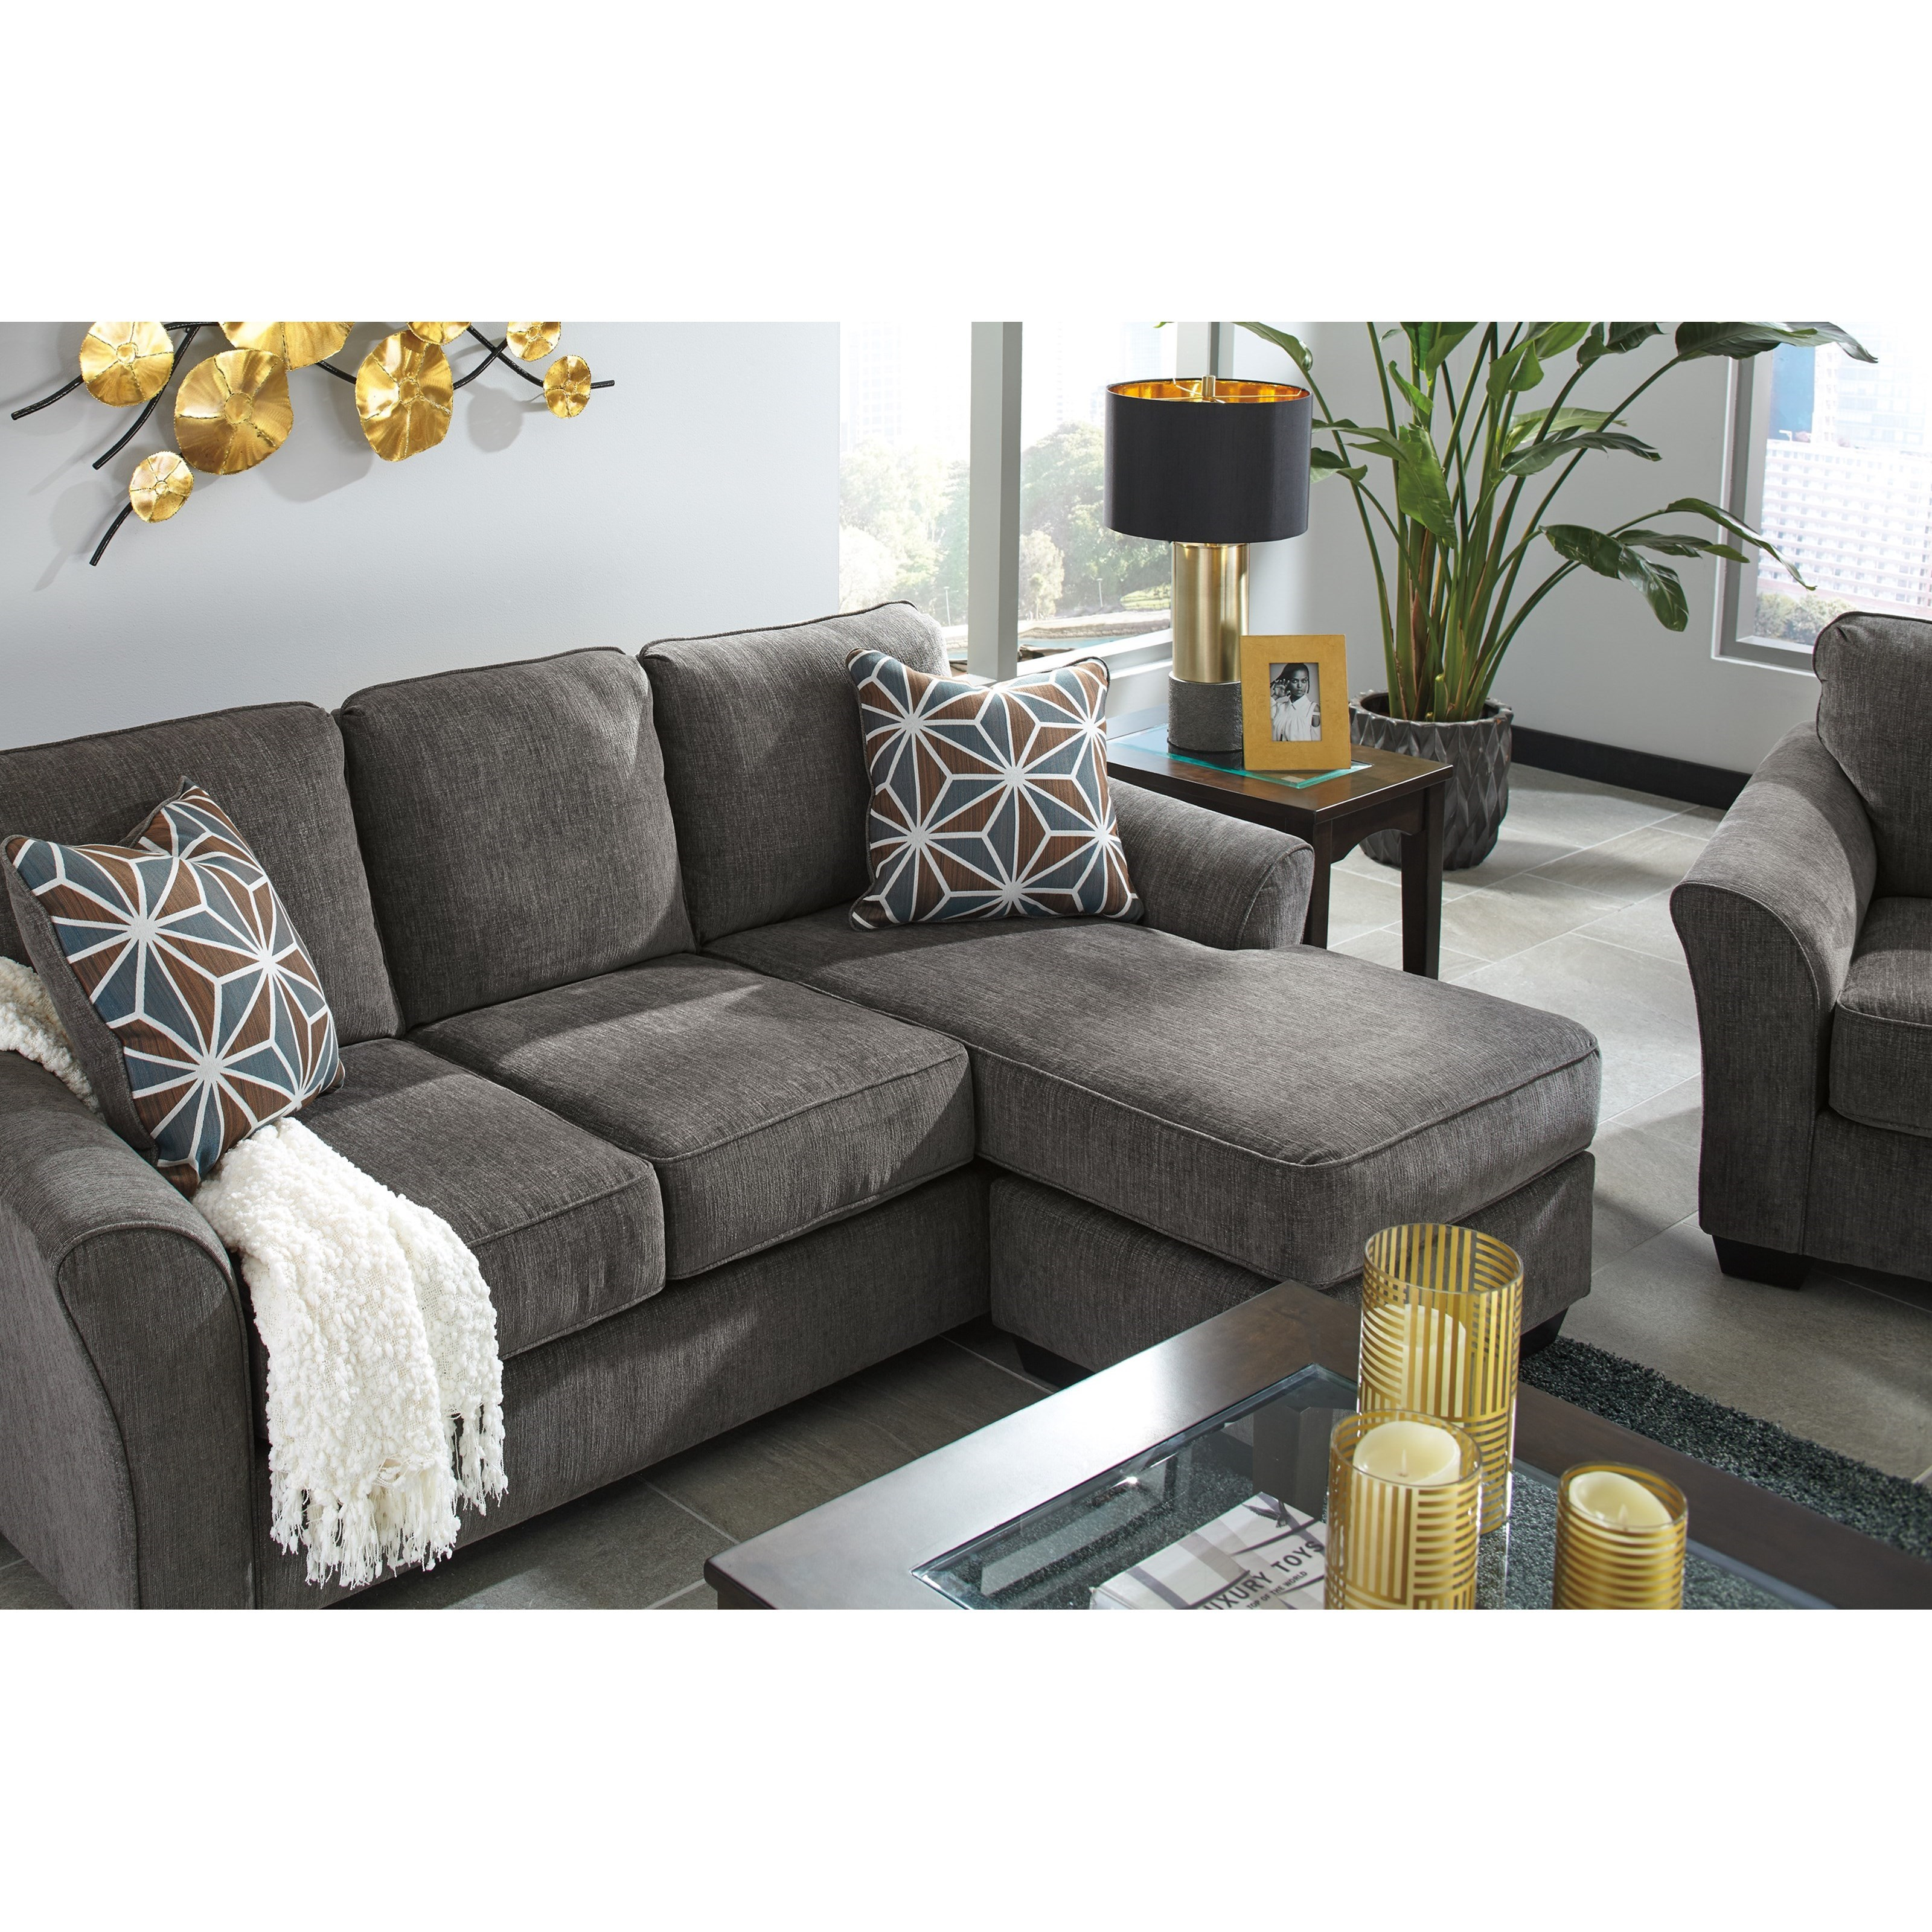 Benchcraft brise 8410268 casual contemporary queen sofa for Divan vs chaise